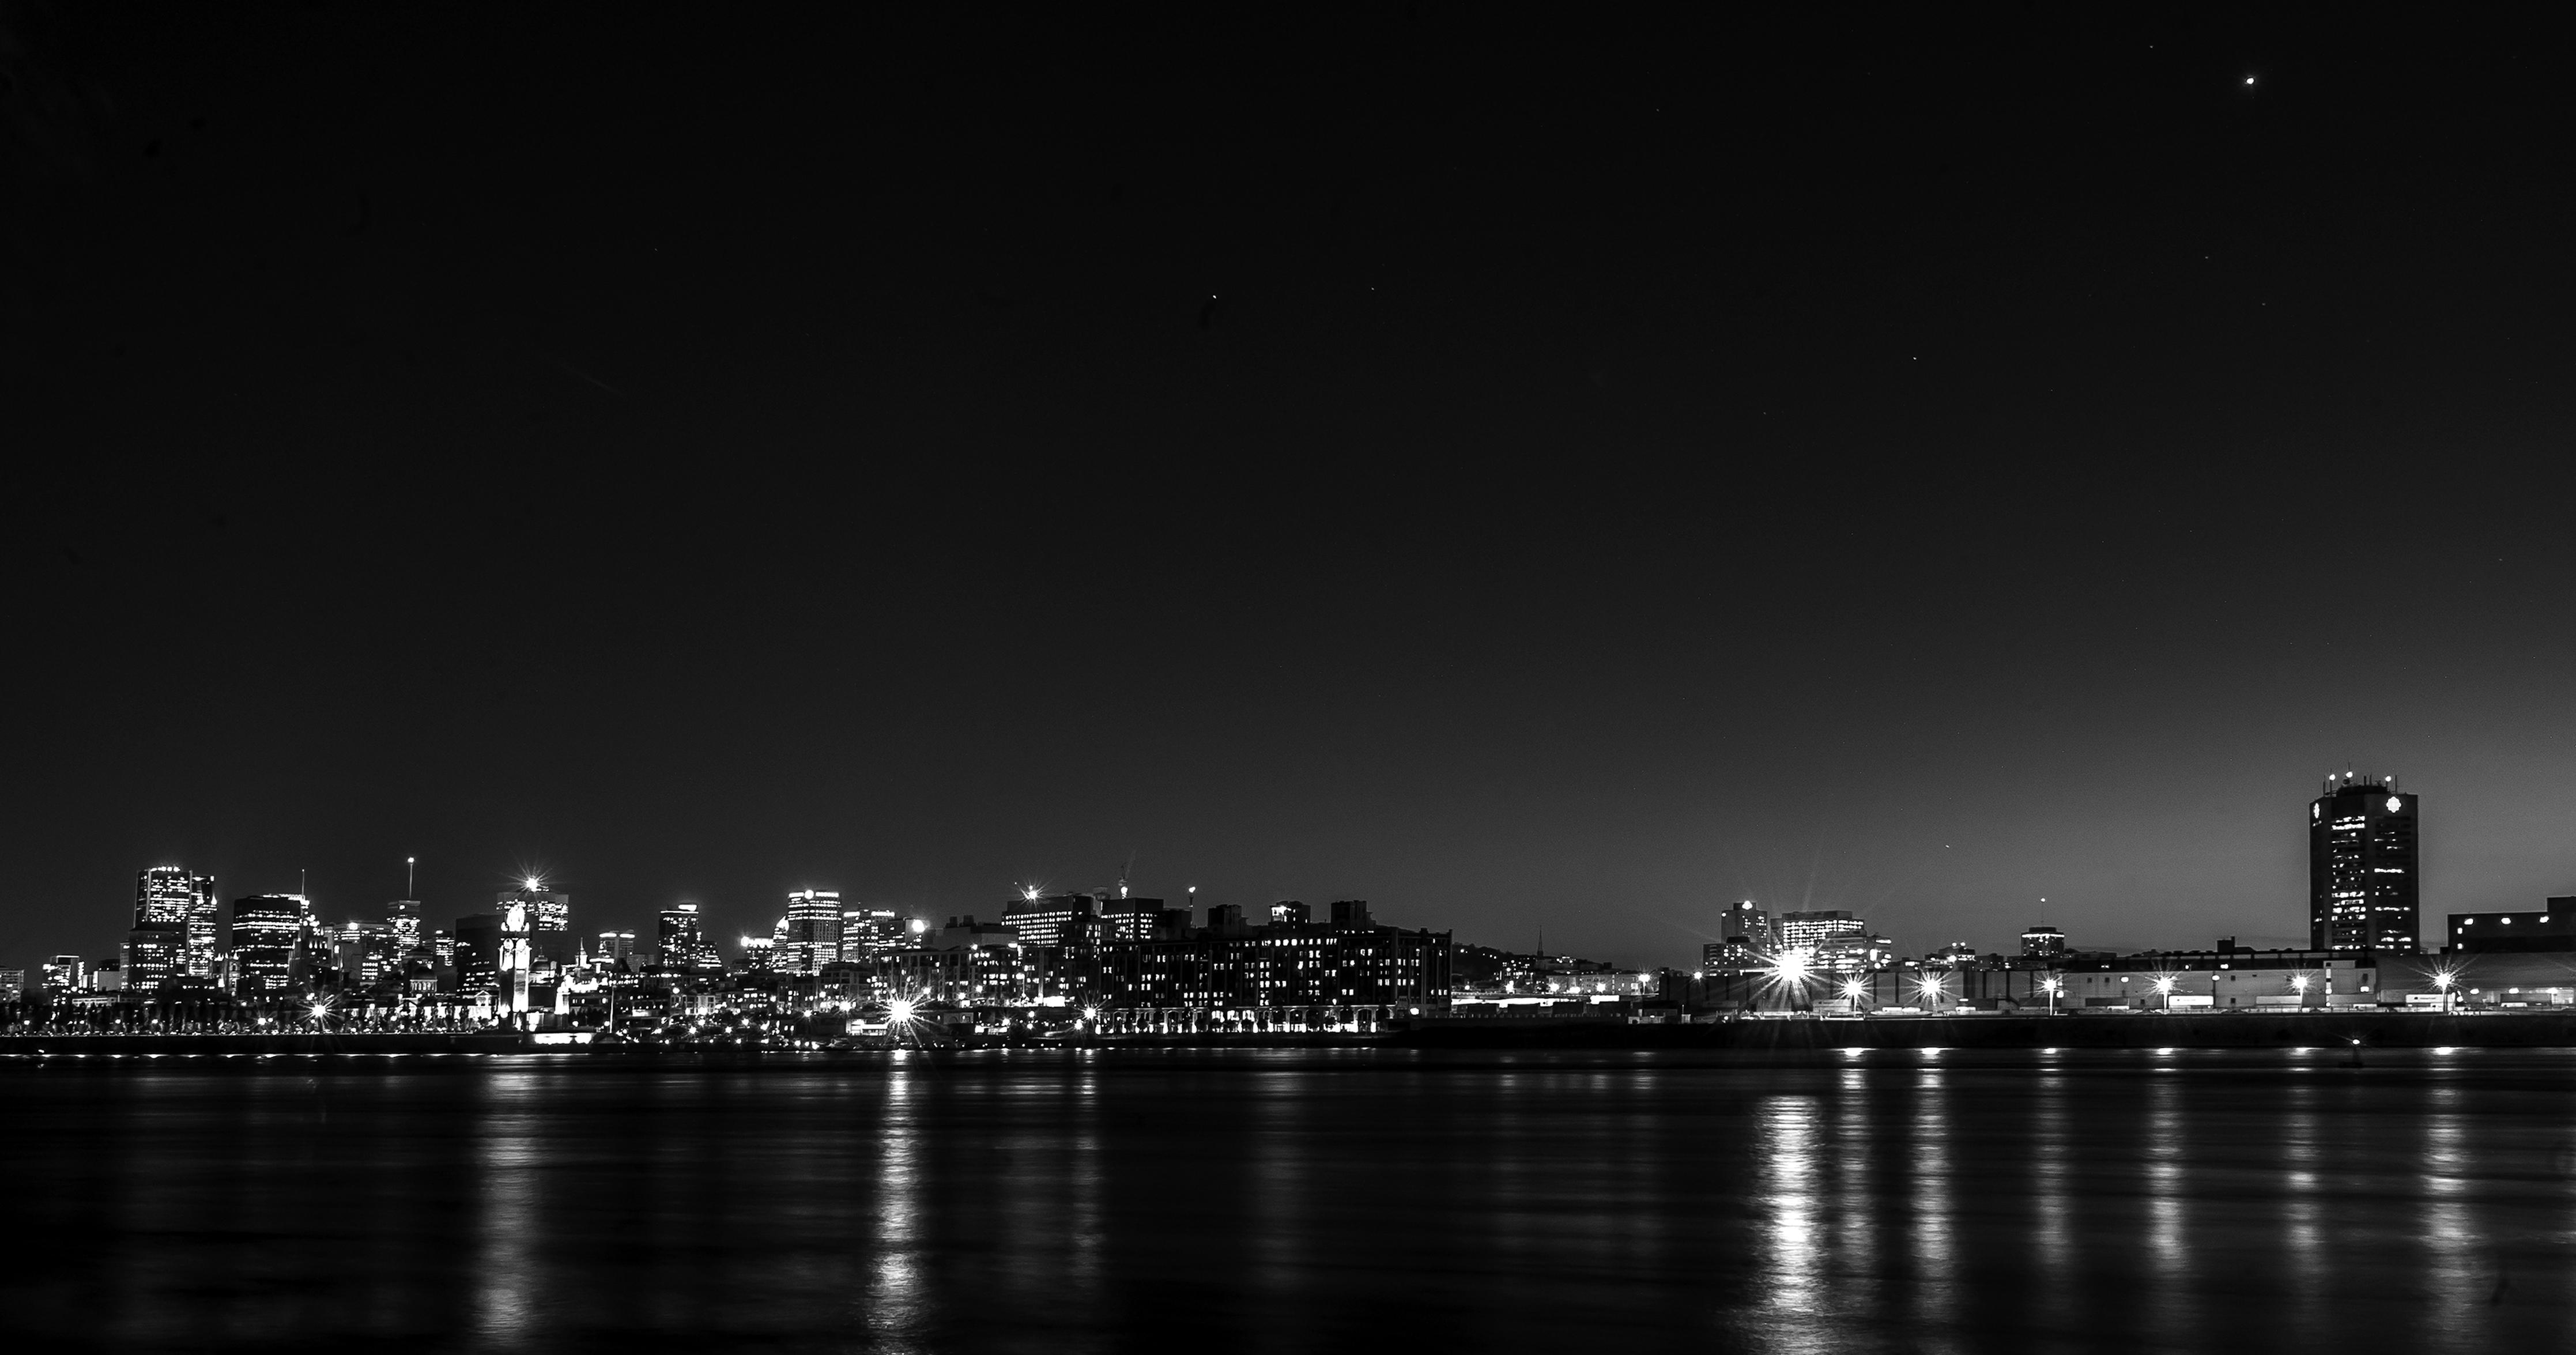 black . City Lit Up at Night Black Wallpaper  Pexels Free Stock Photos